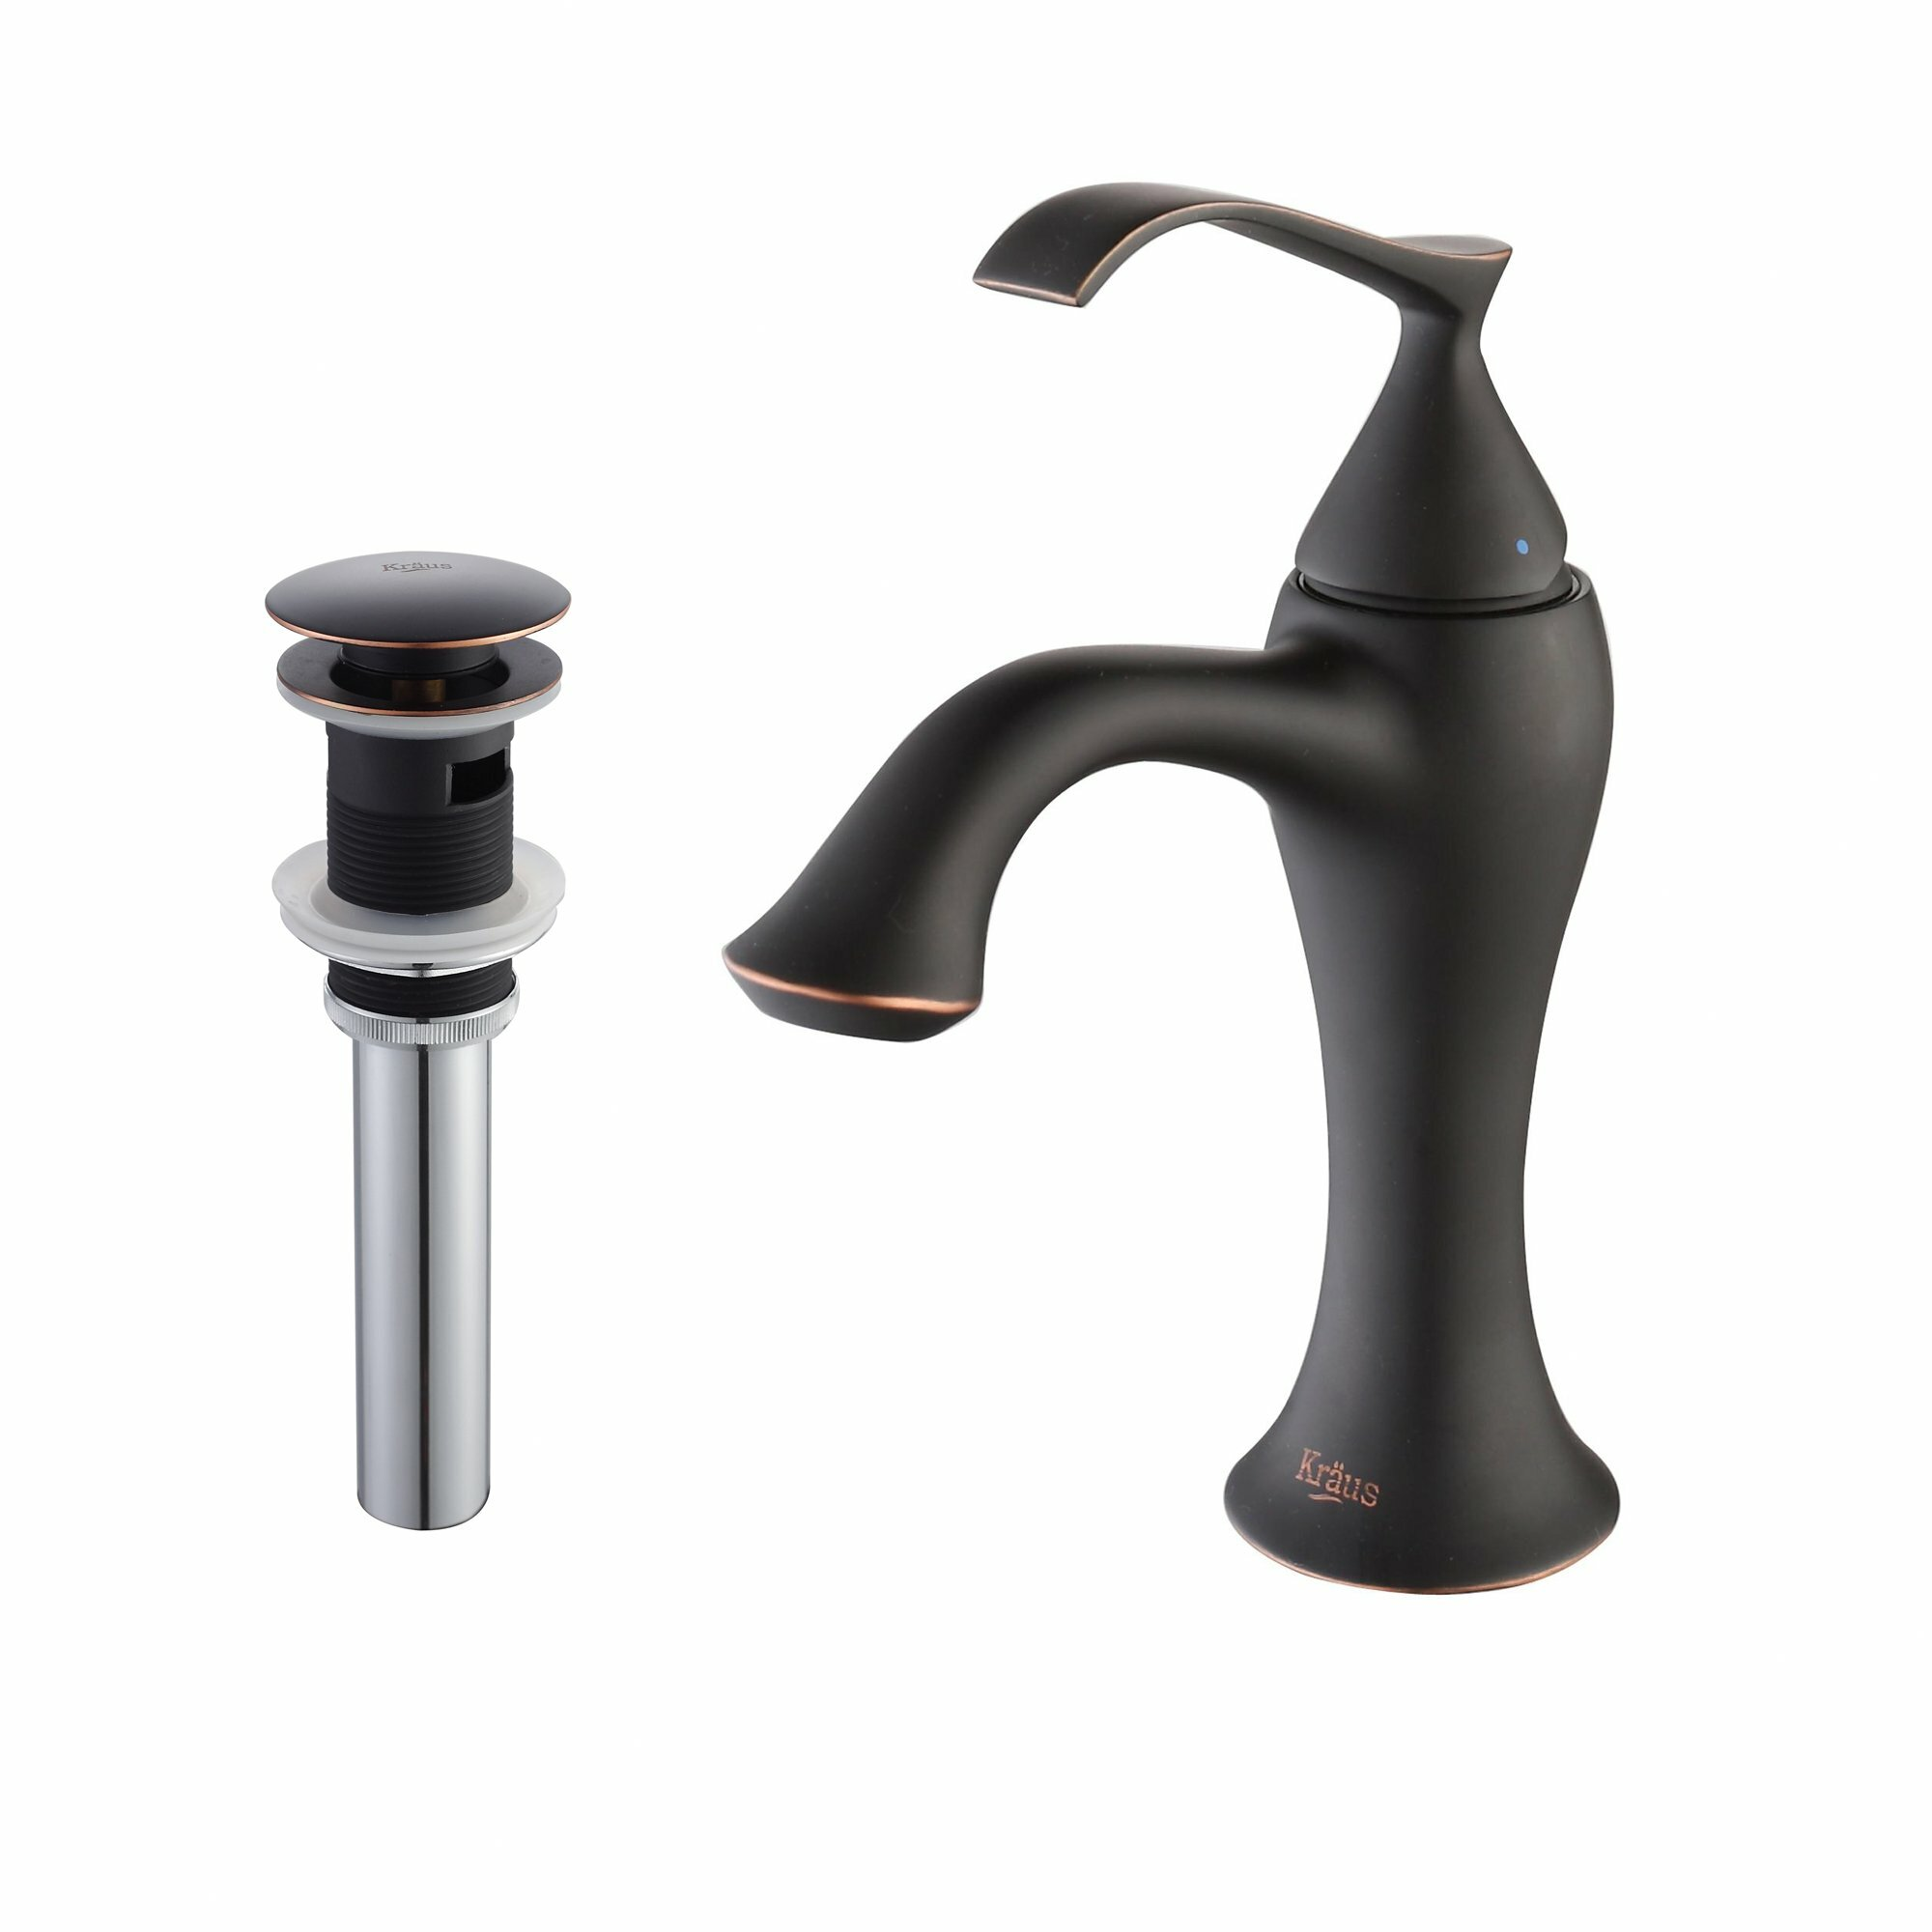 Kraus  Kitchen amp Bathroom Sinks and Faucets  KrausUSAcom